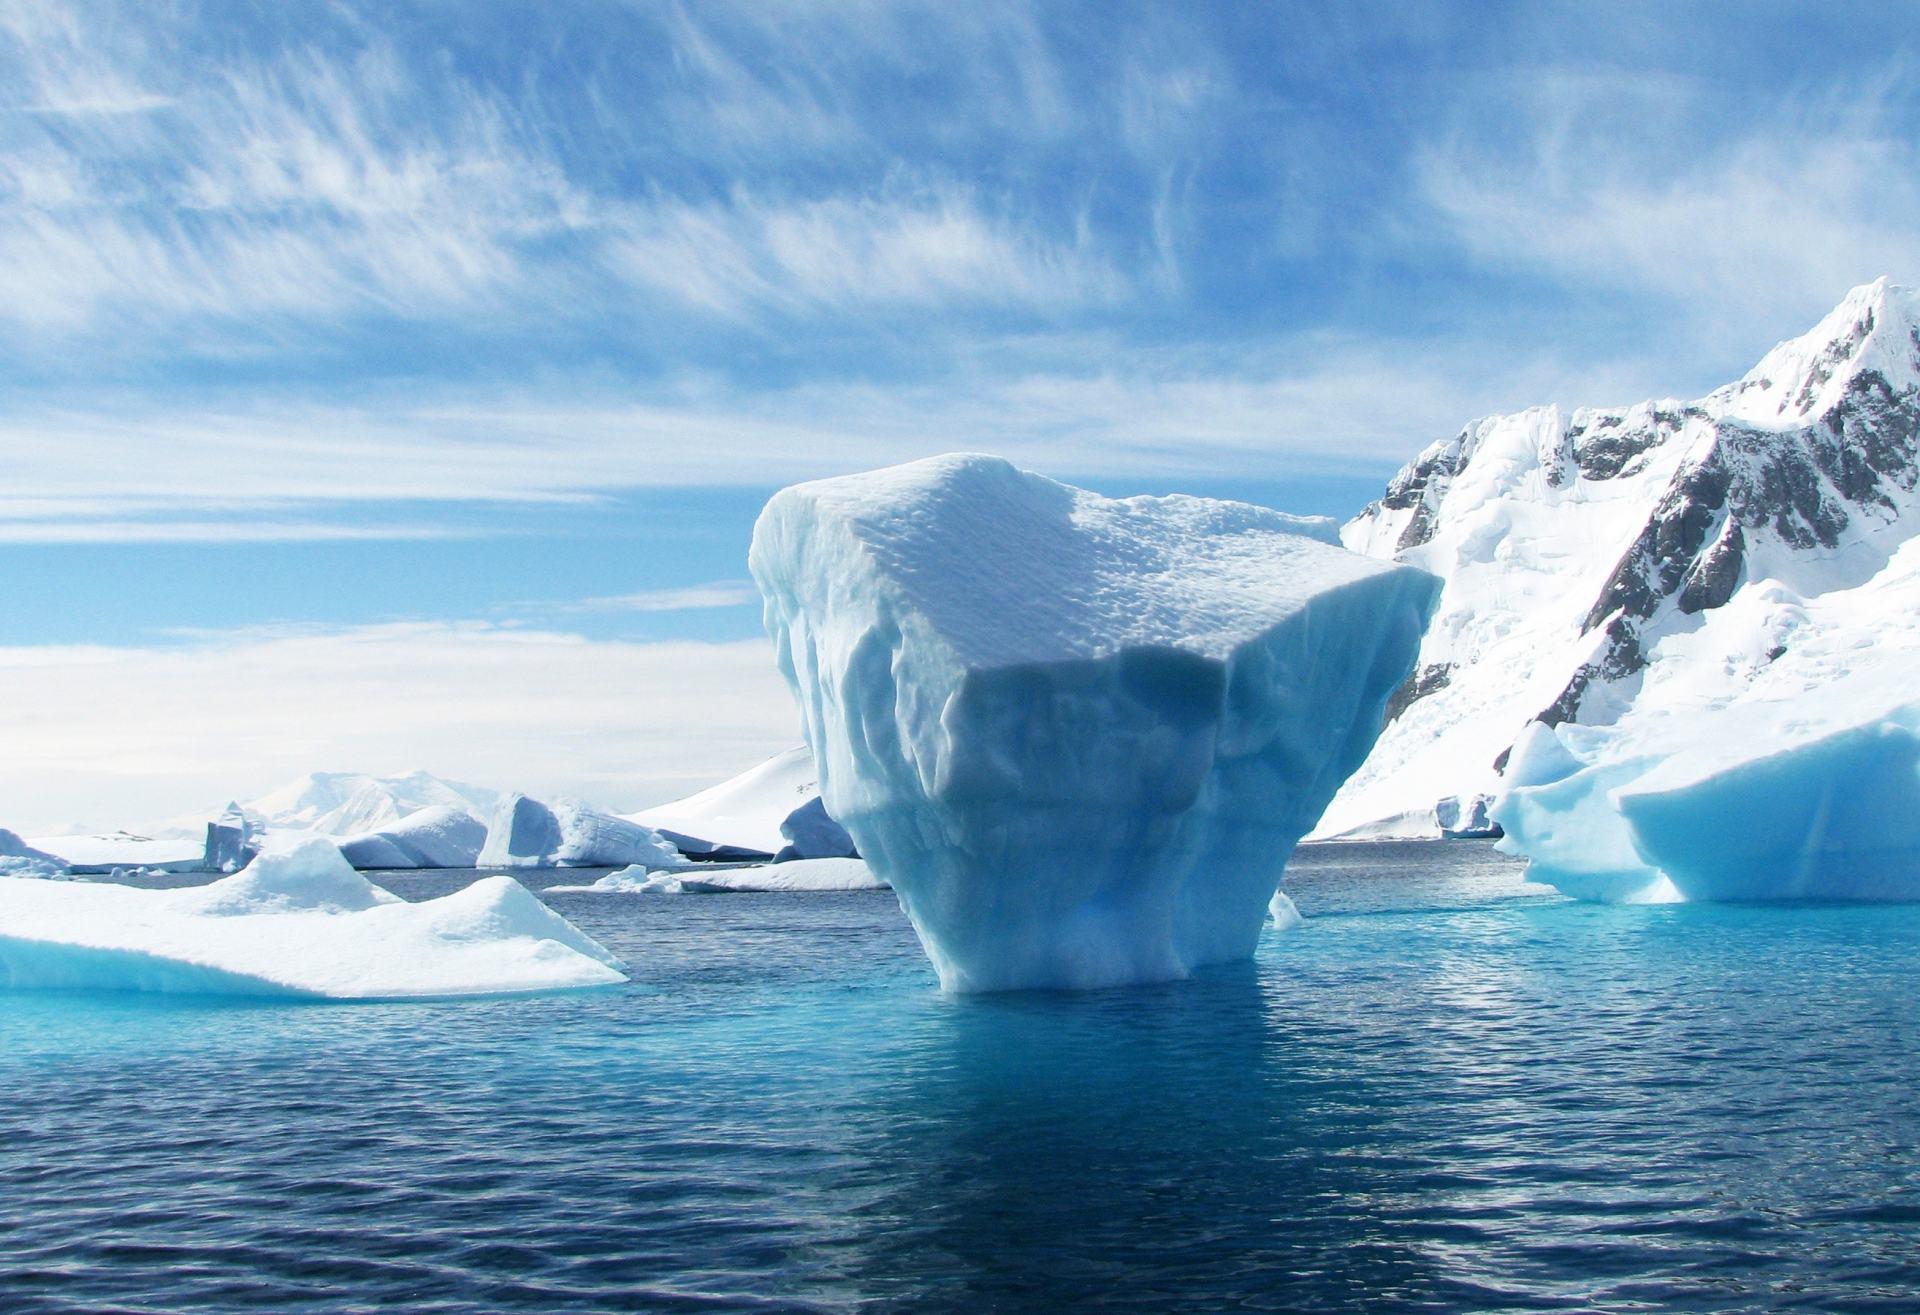 antarctica-arctic-clouds-53389.jpg